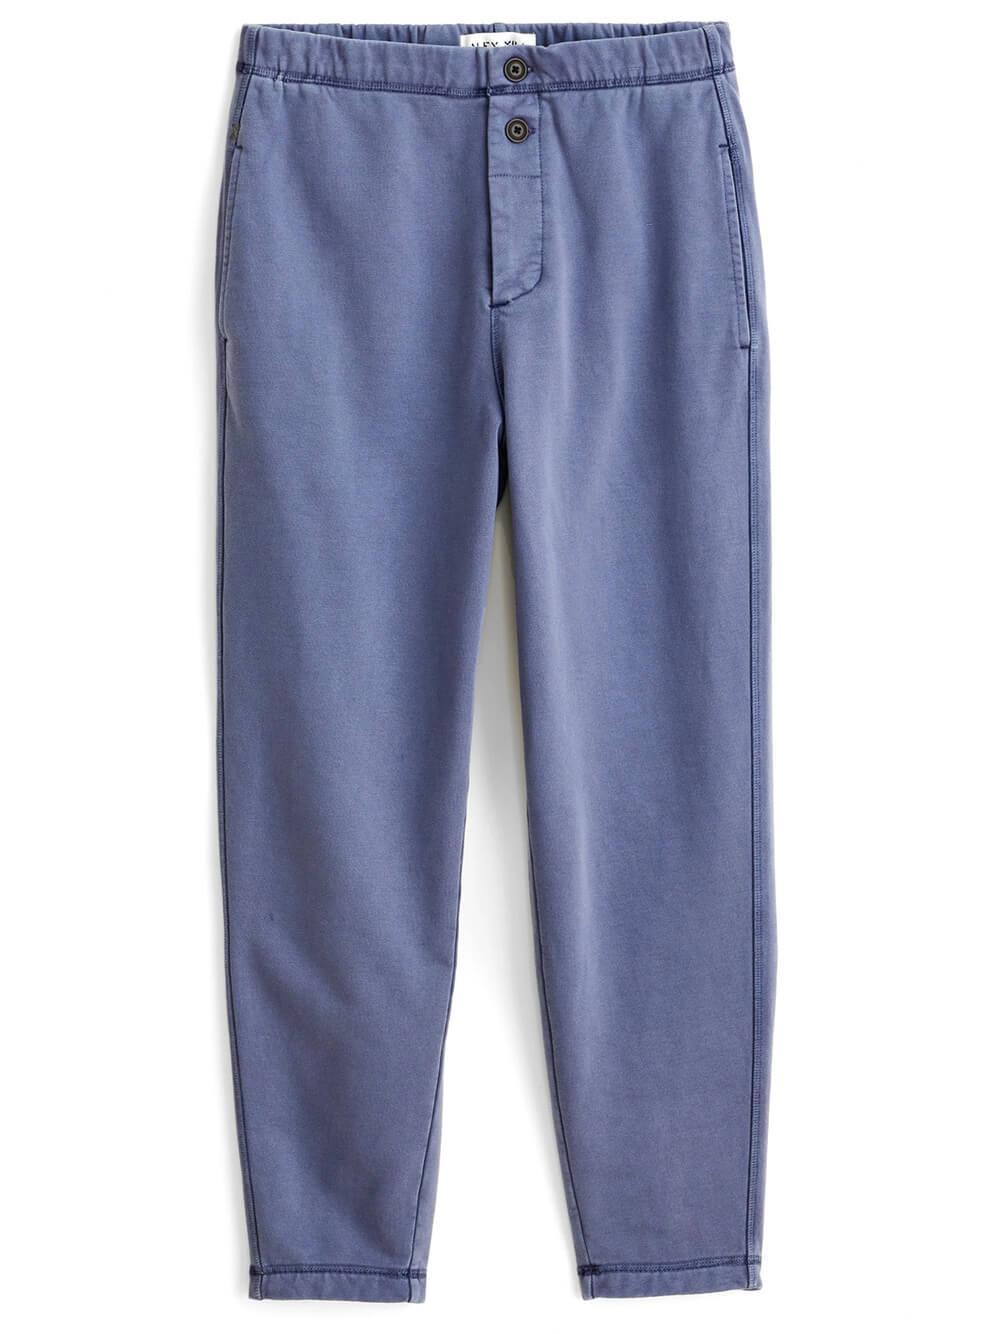 Davie Fleece Pants